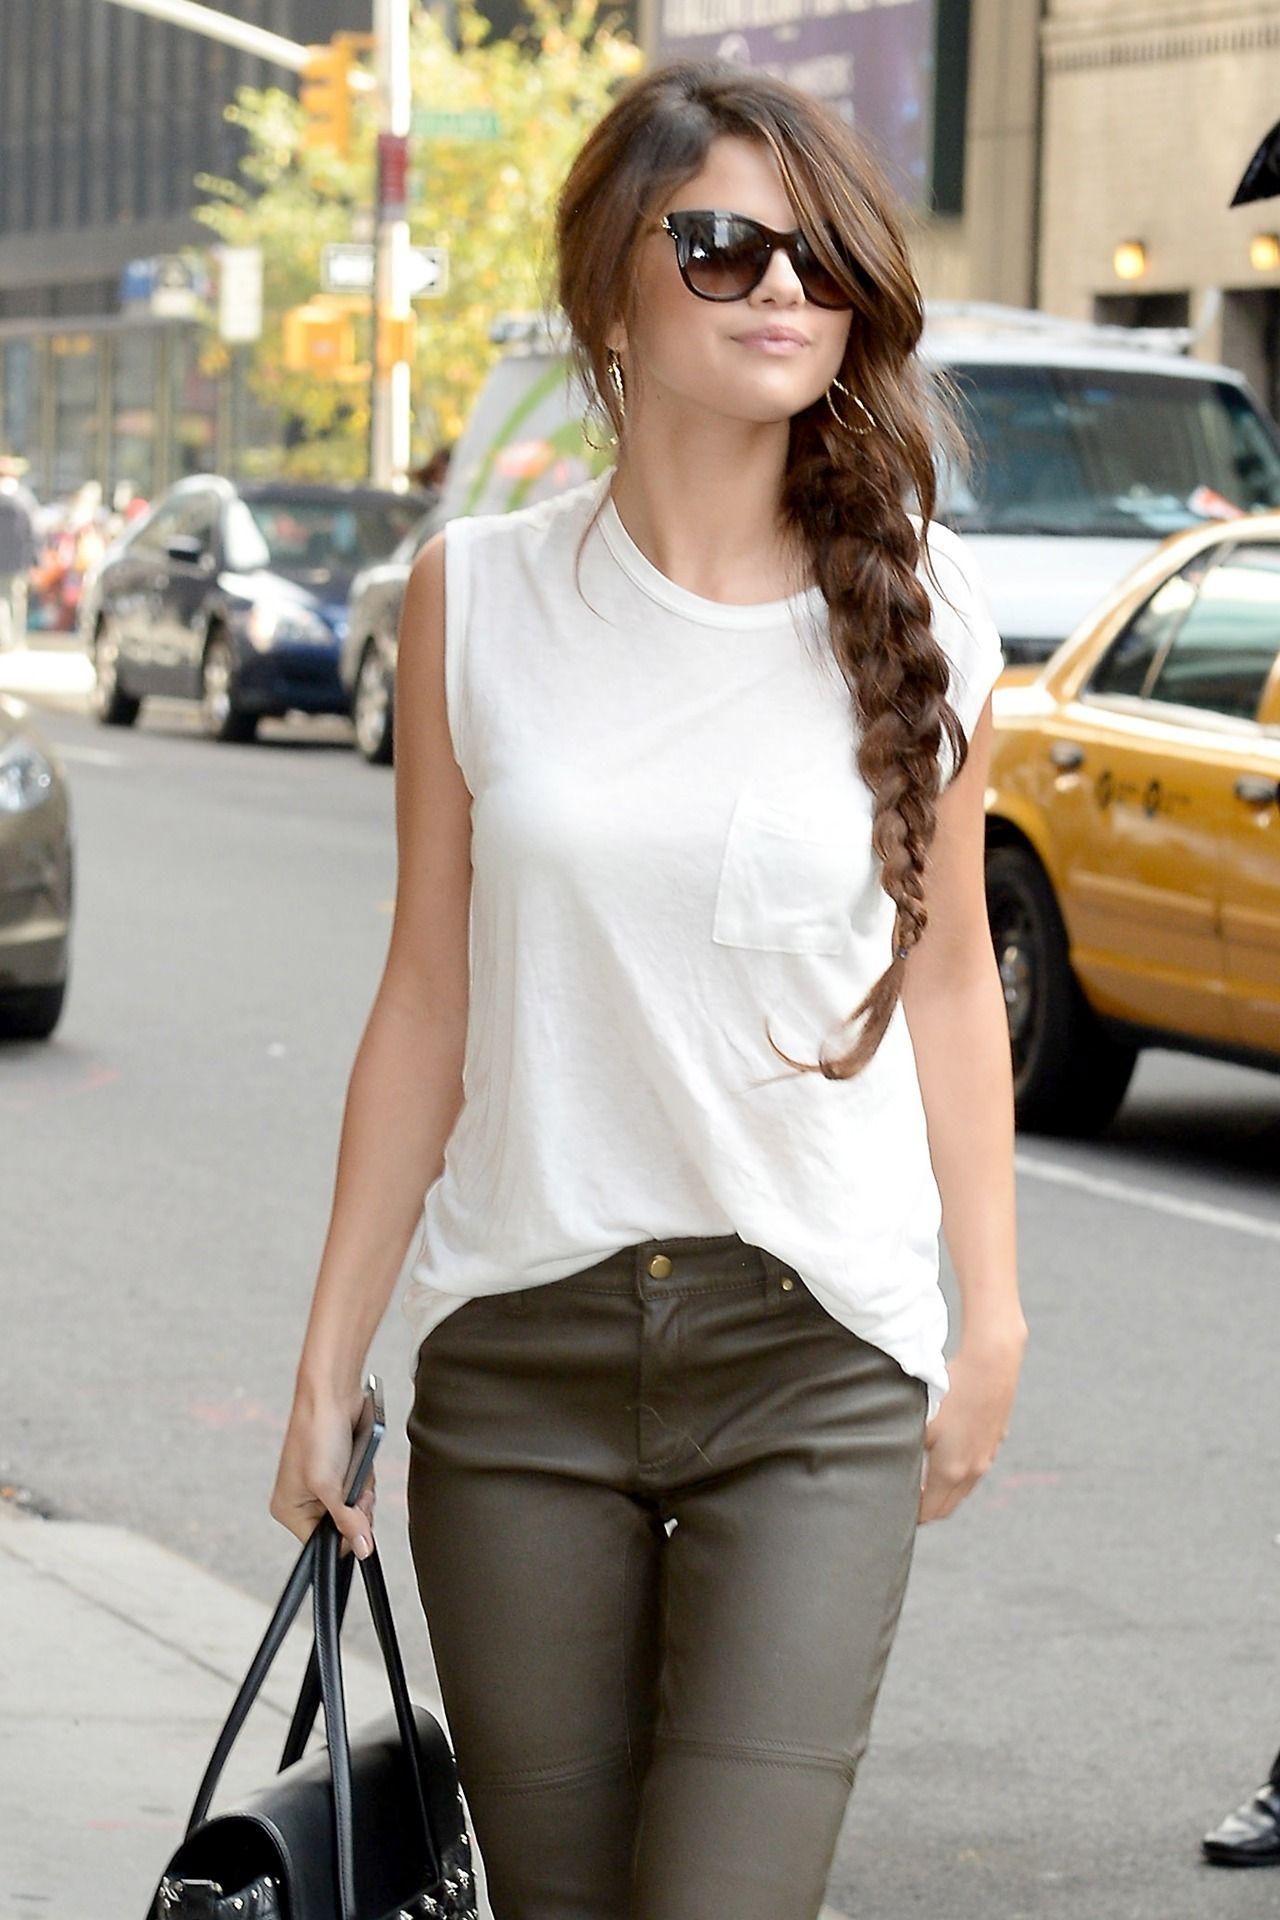 Selena Gomez Street Style - Casual